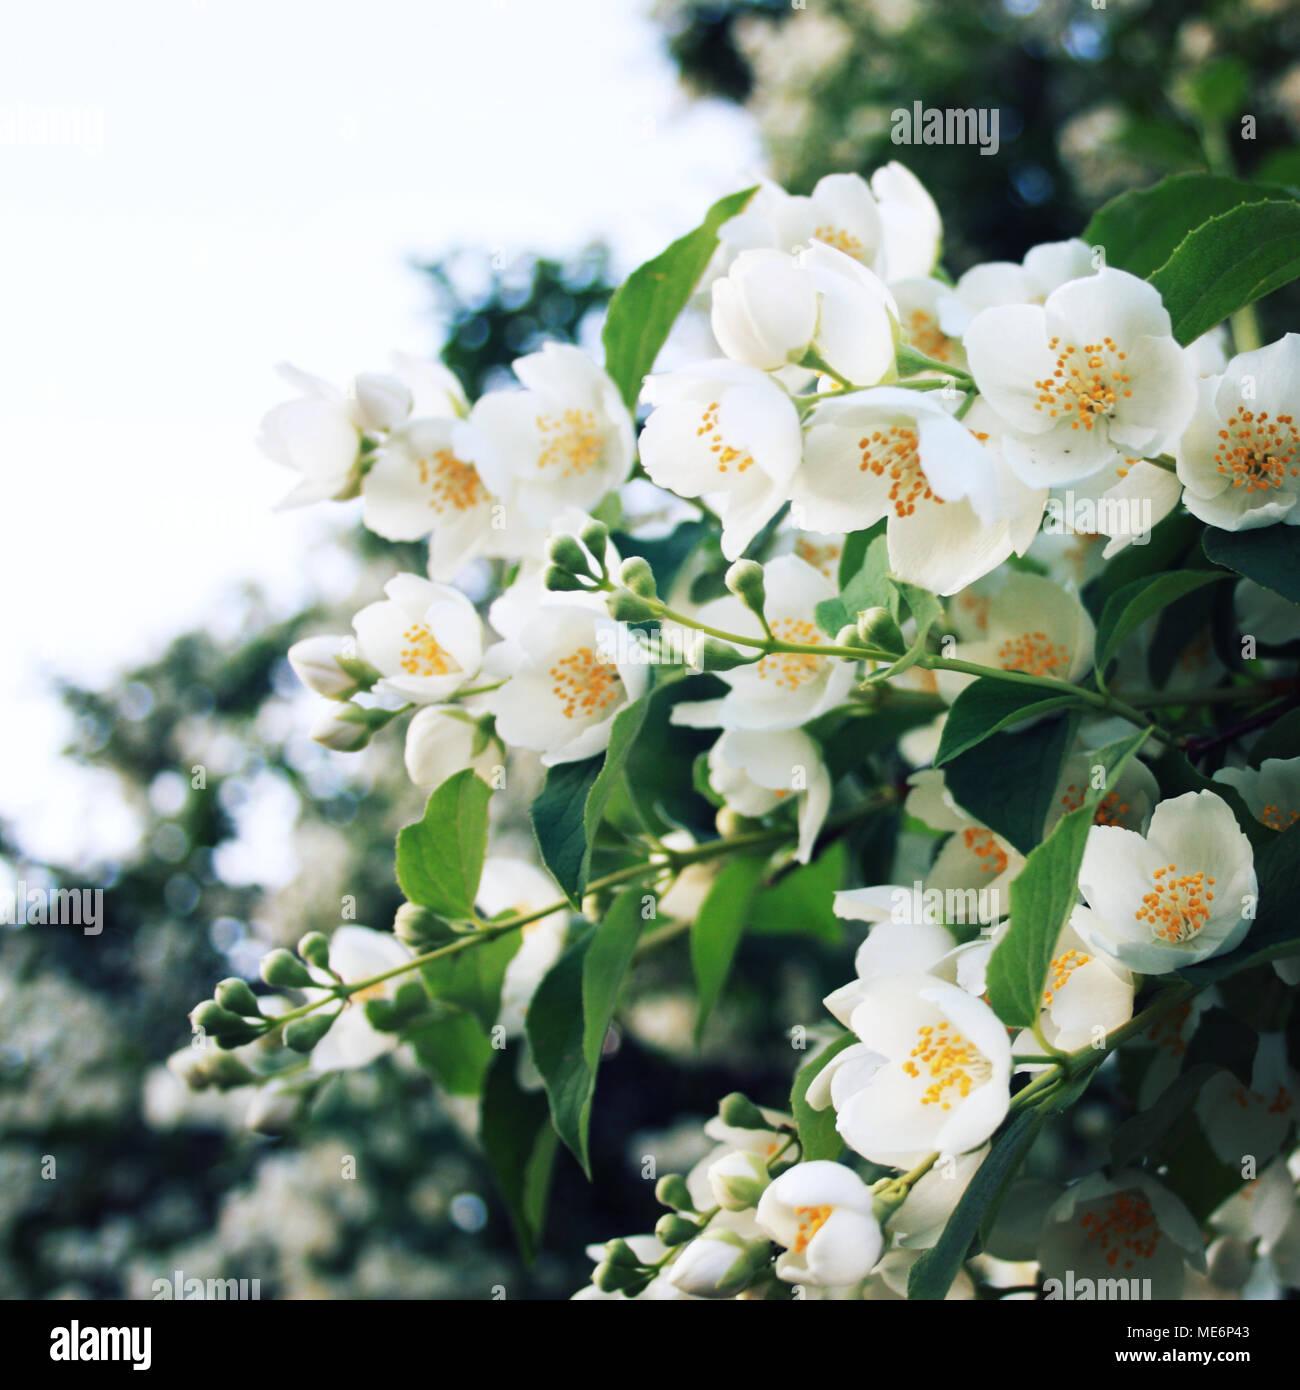 Jasmine Like Flowers In Bloom Aged Photo Close Up Philadelphus